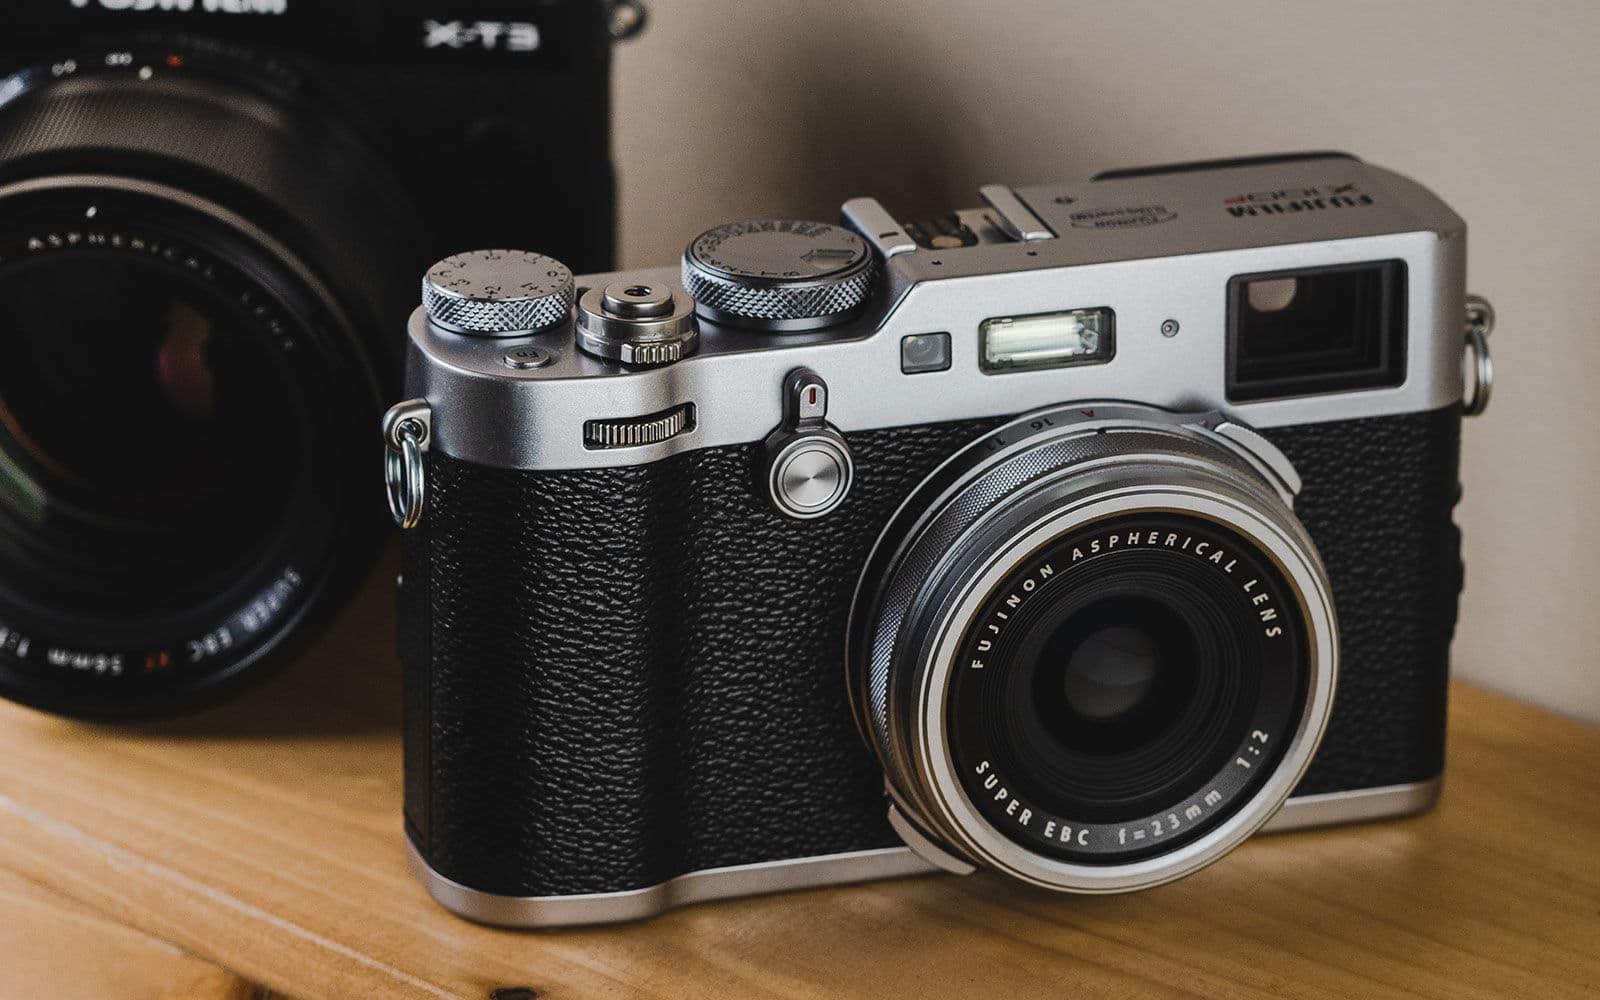 Fujifilm X100F compact camera for street photos